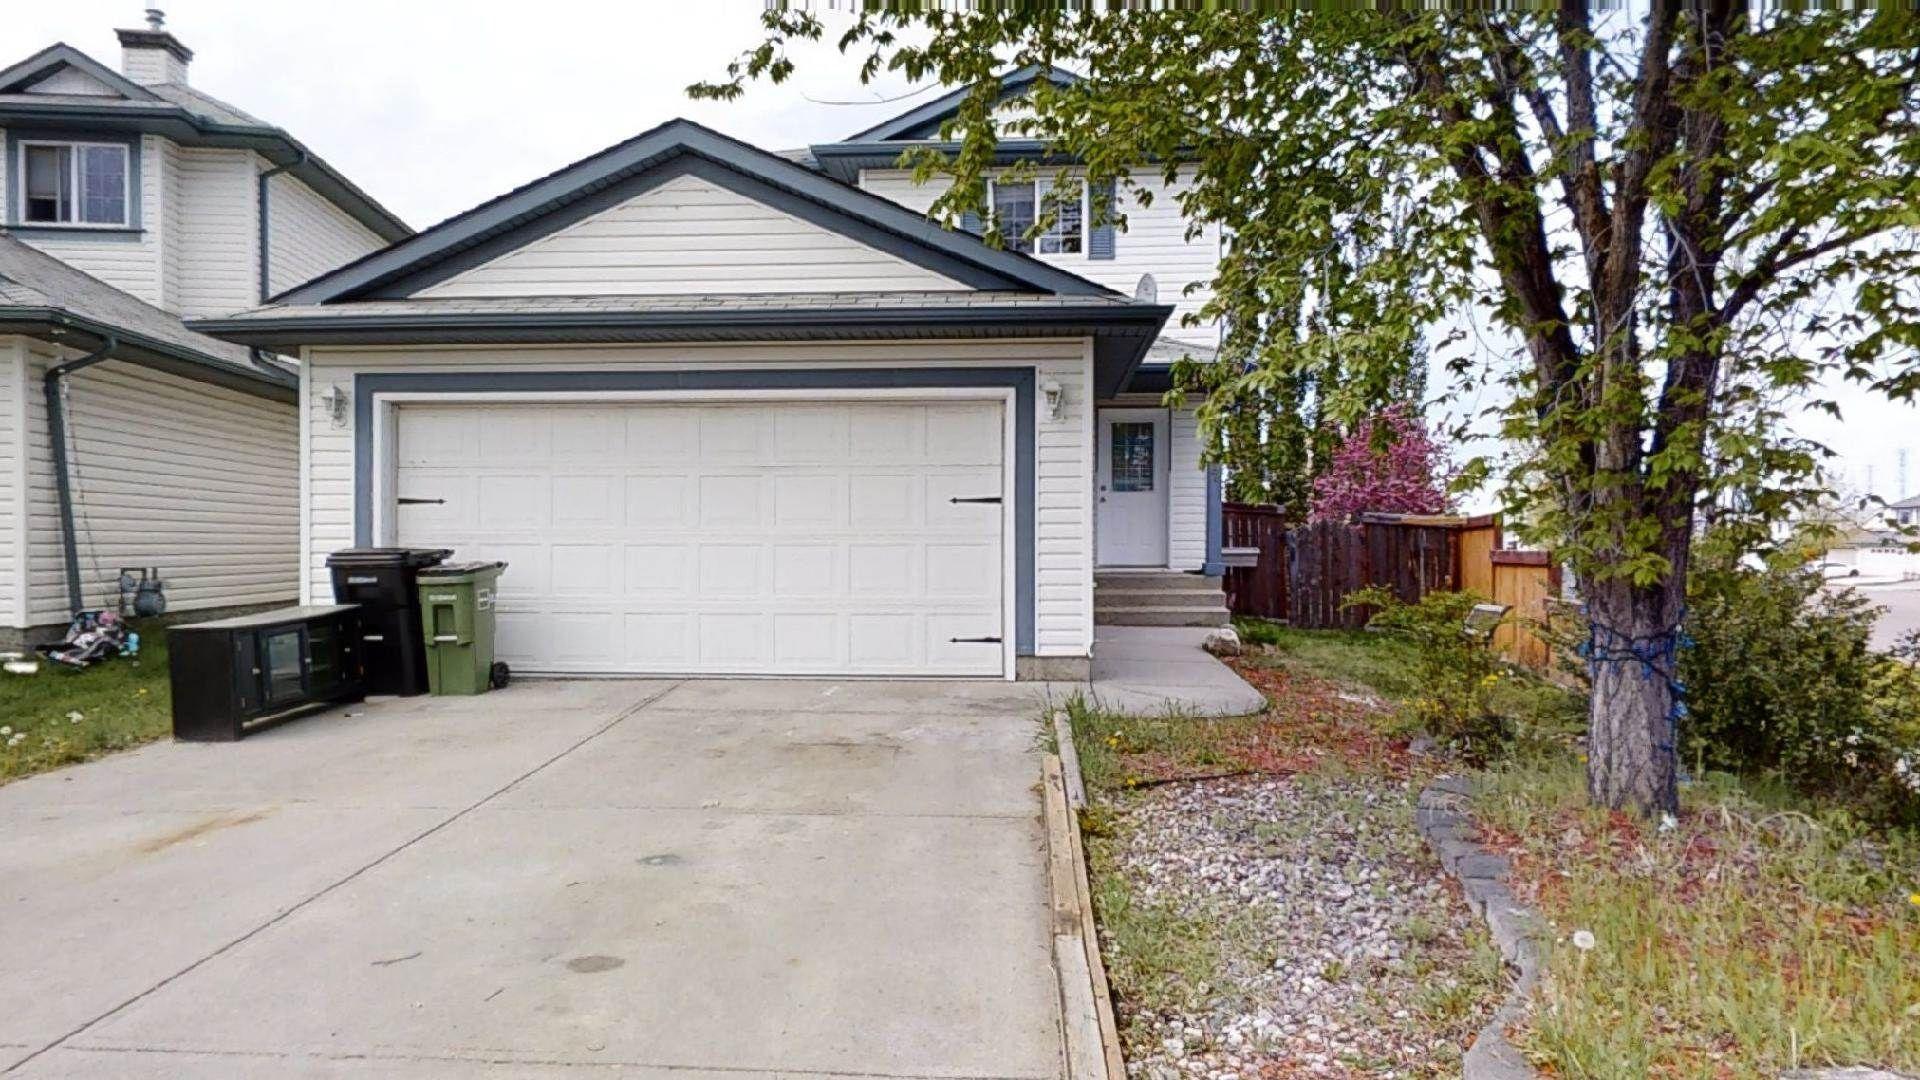 Main Photo: 2117 37A Avenue in Edmonton: Zone 30 House for sale : MLS®# E4247532